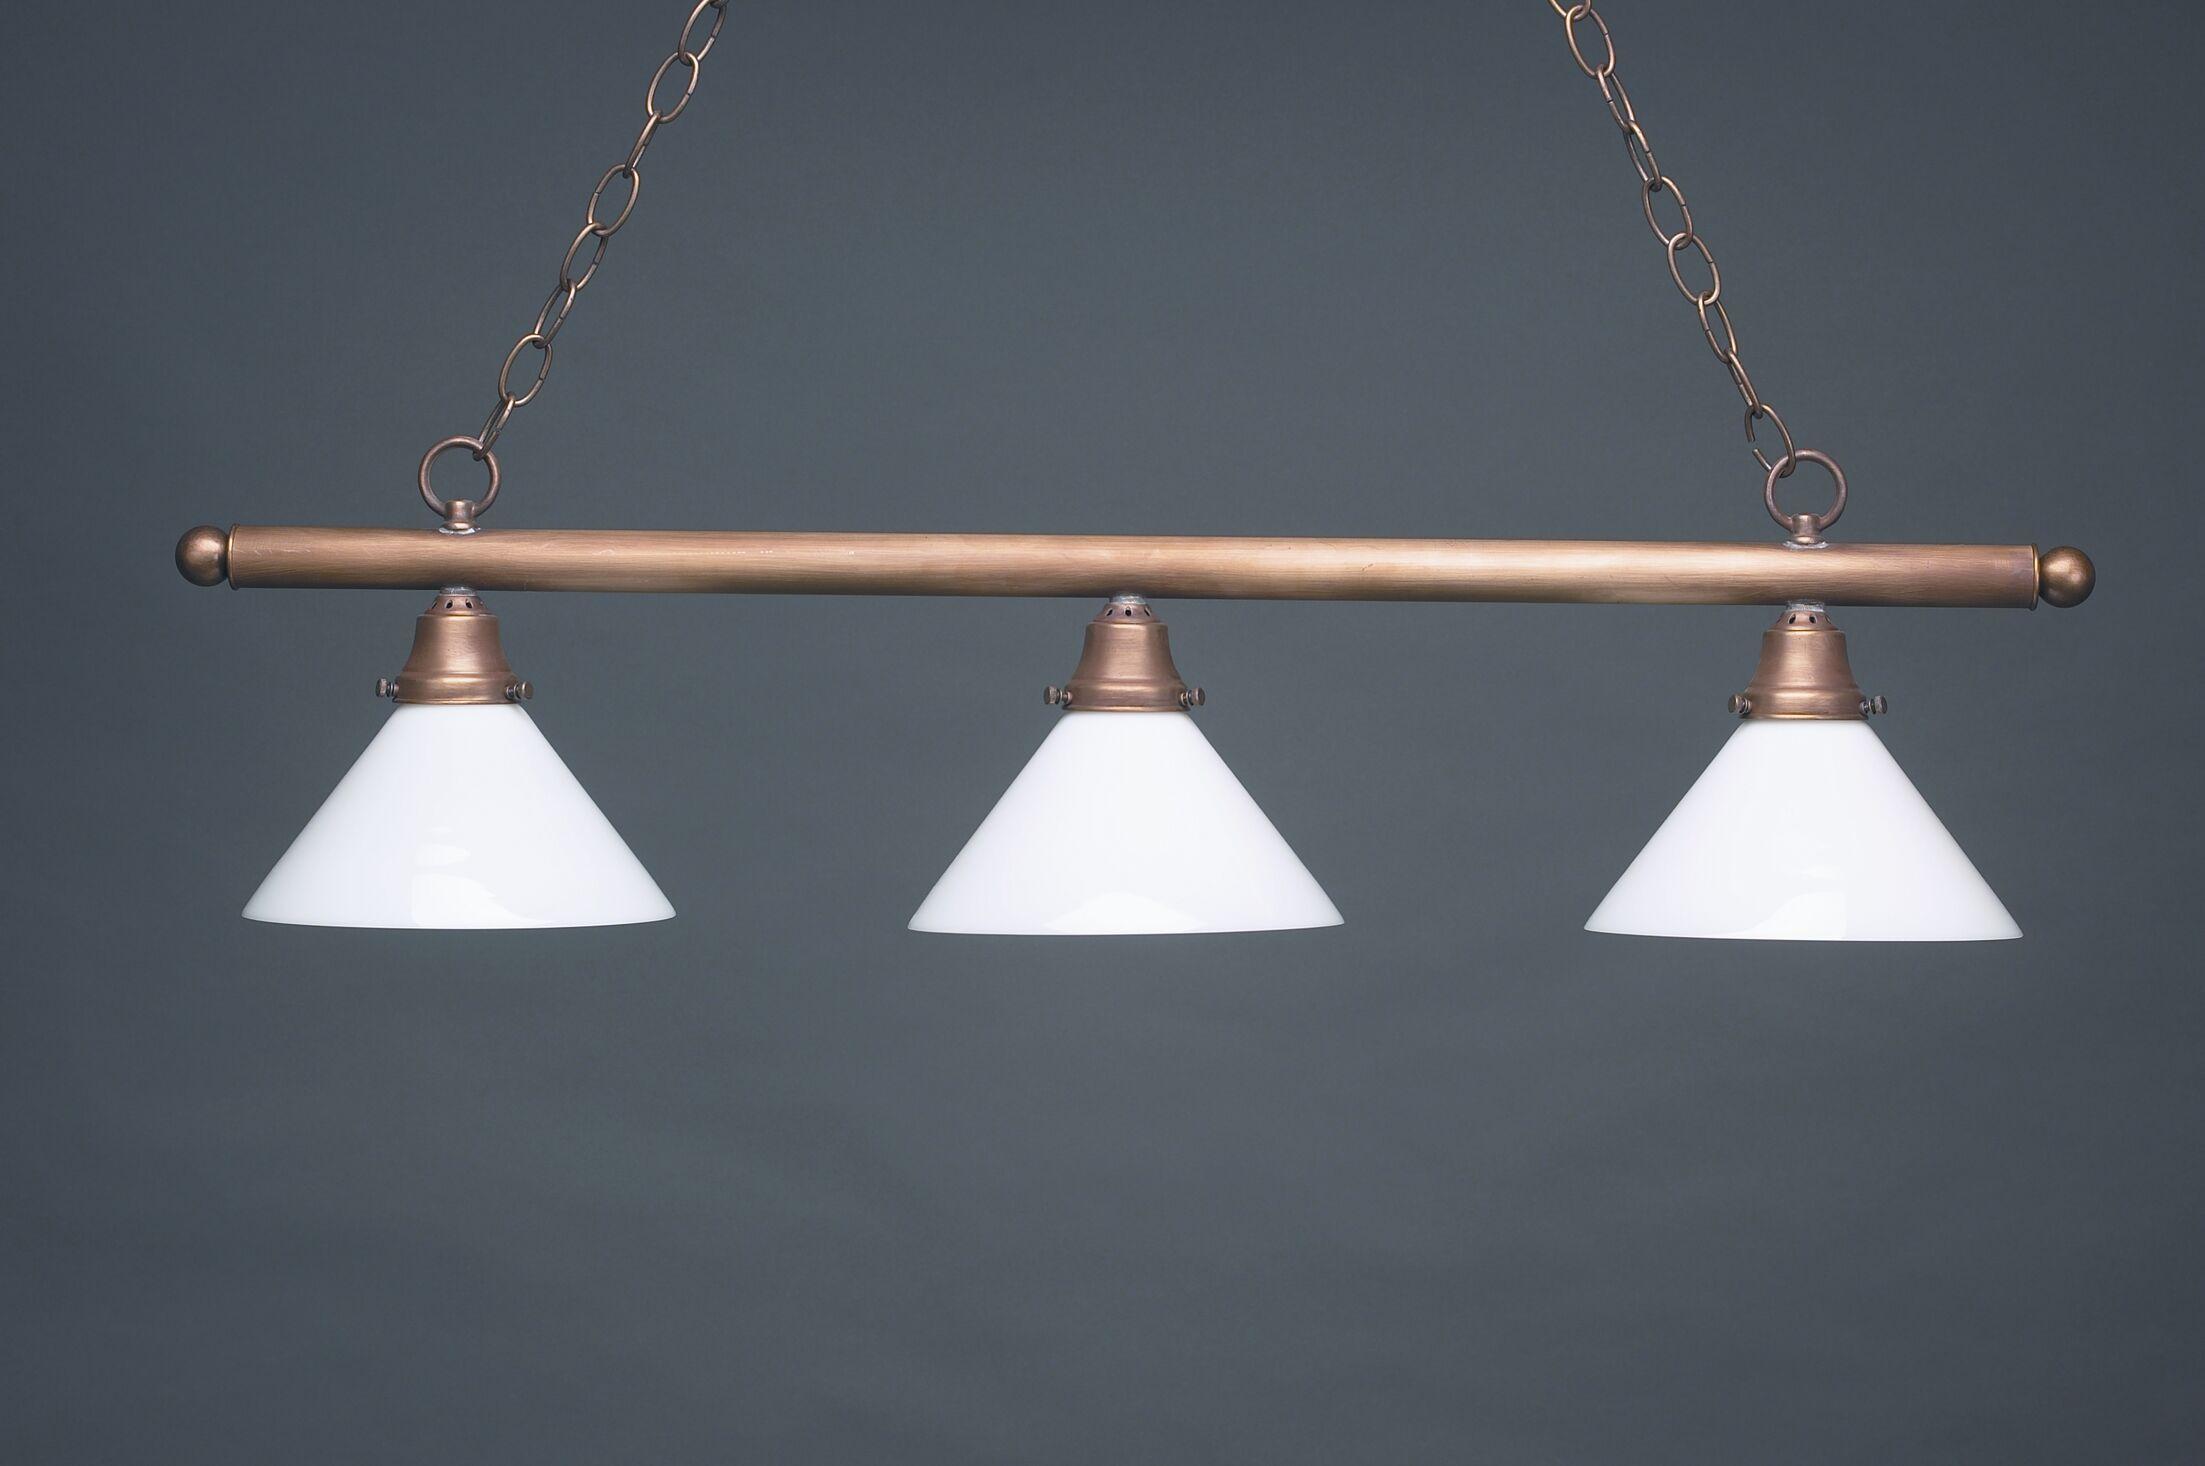 Pendant Three Medium Base Sockets Hanging Pendant Finish: Antique Brass, Glass Type: 50W White